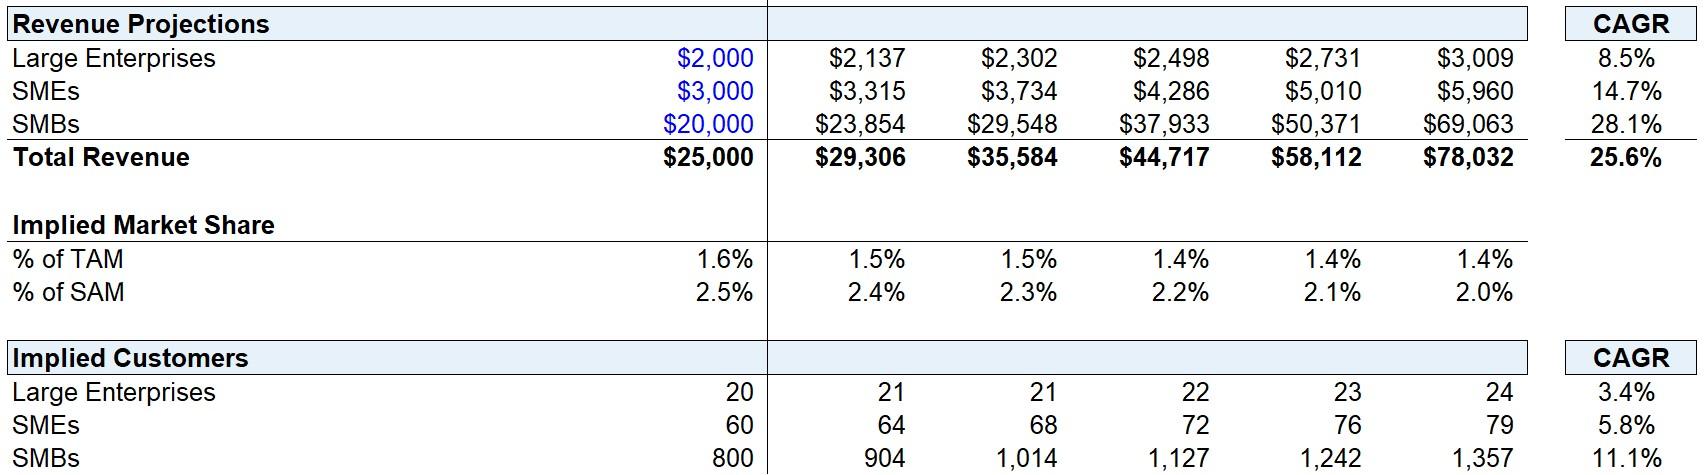 Revenue Projections - Downside Case